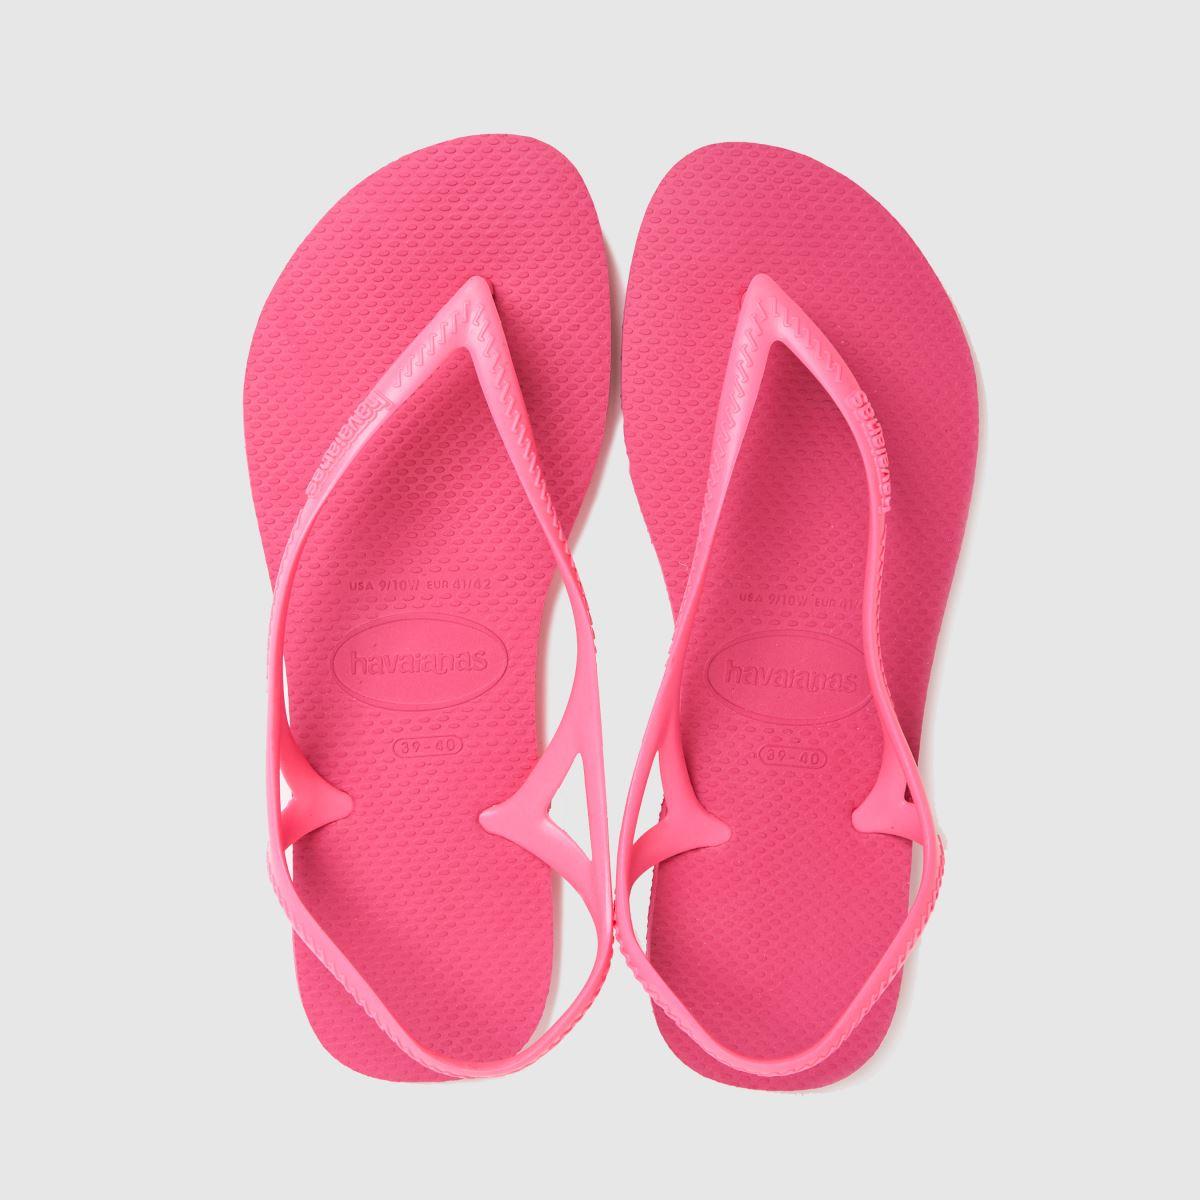 Havaianas Pink Sunny Ii Sandals